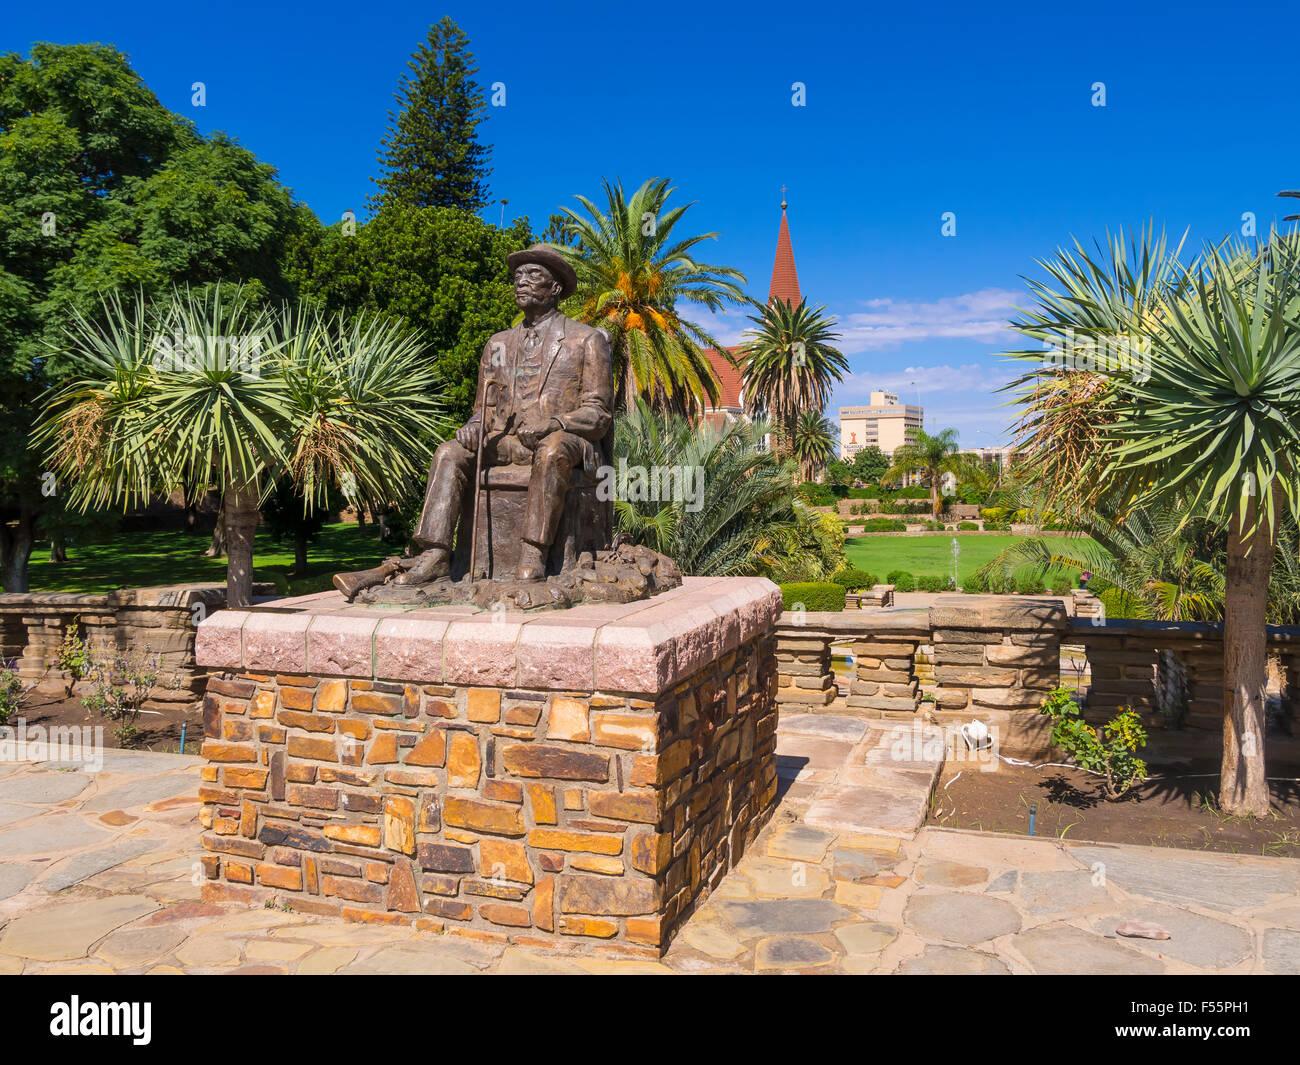 Hosea Kutako Memorial, 1870-1970, Head of State, Parliament Garden, Windhoek, Namibia - Stock Image